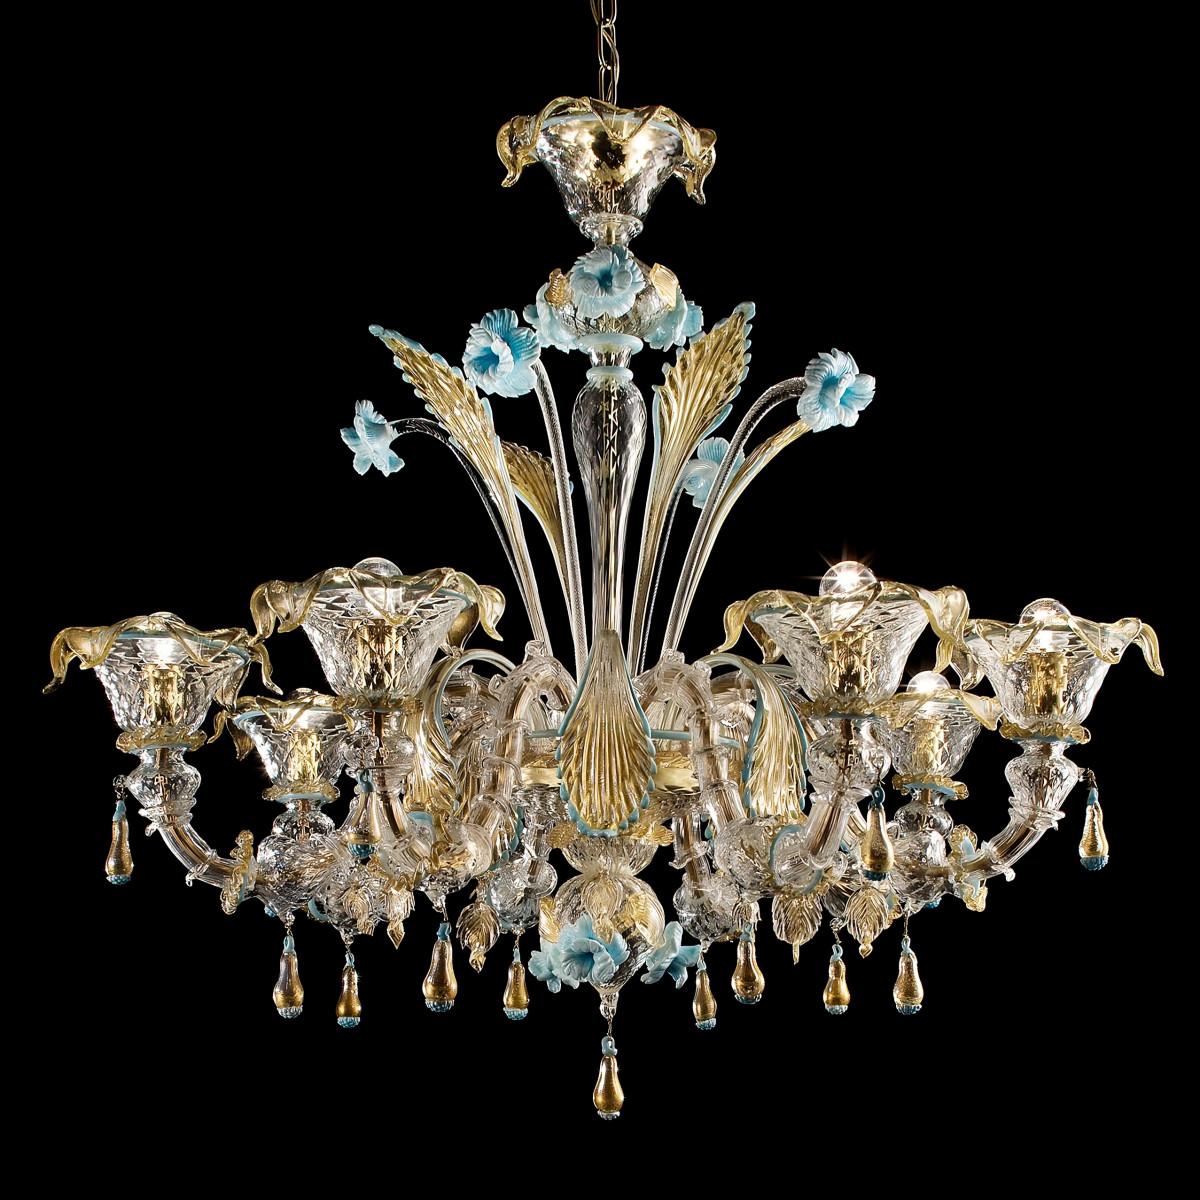 Primavera Murano glas Kronleuchter 8 flammig - transparent gold blau farbe